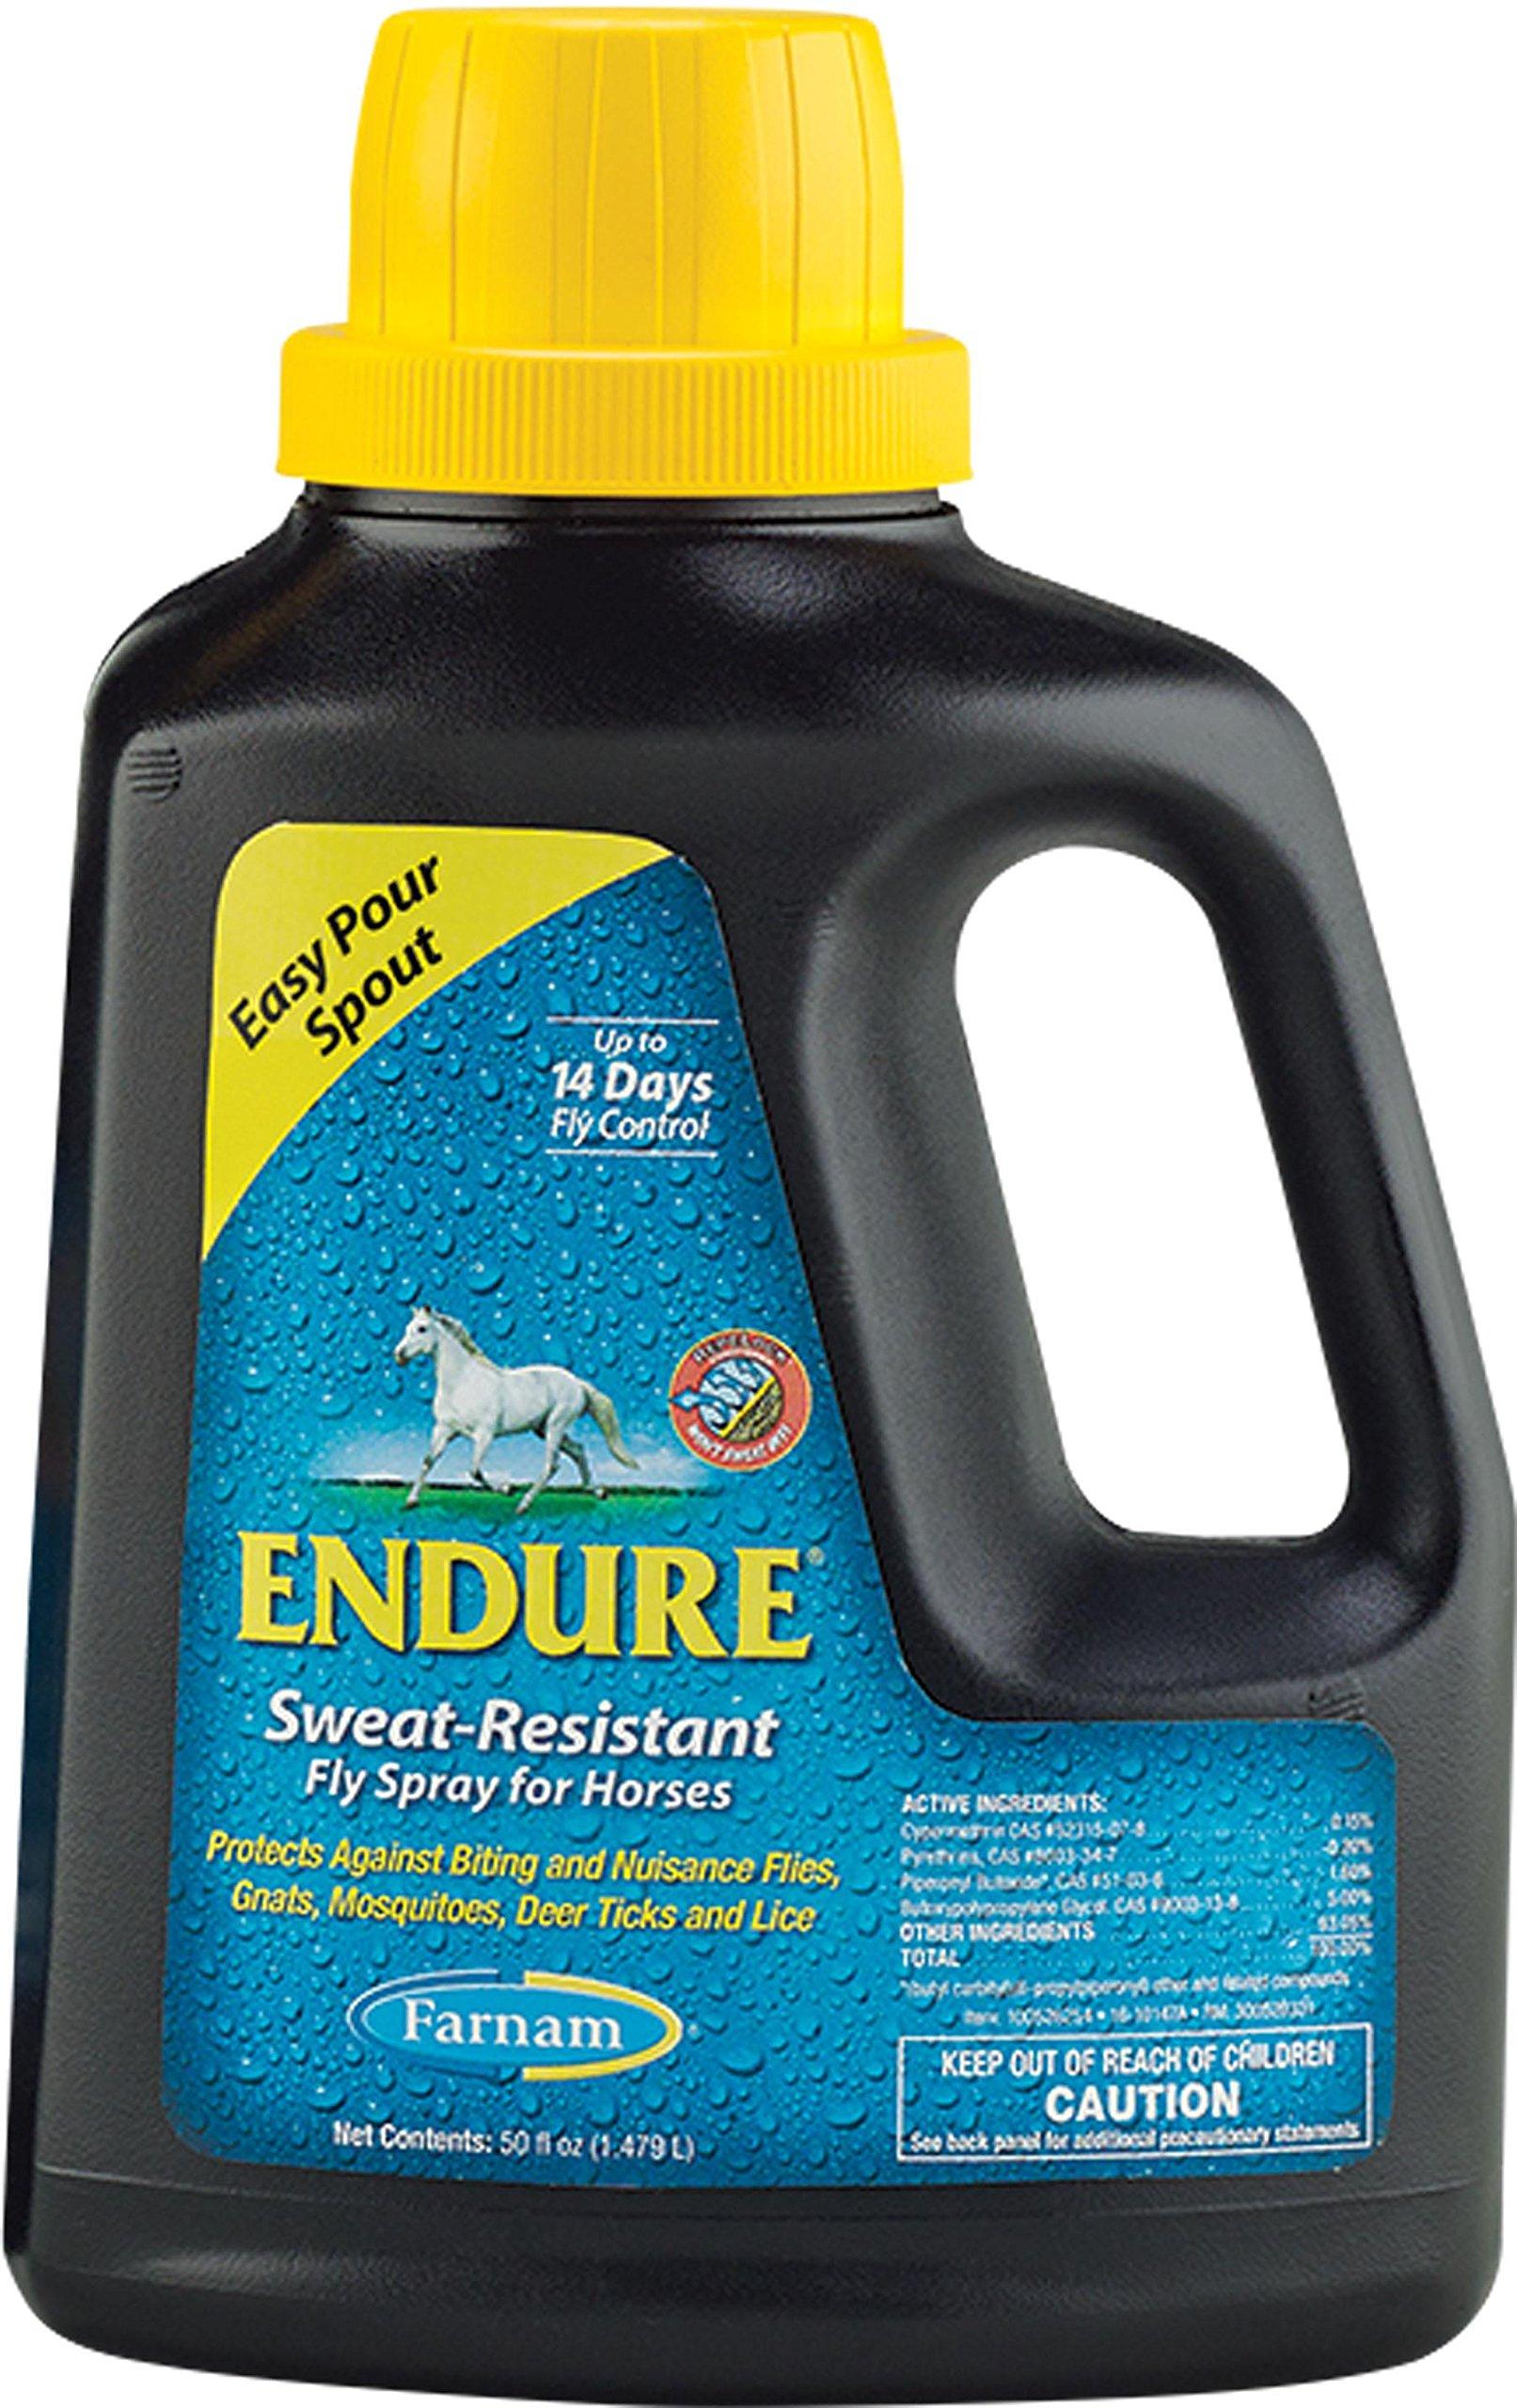 FARNAM Companies INC Endure Sweat-Resistant Fly Spray for Horses 50 Ounce